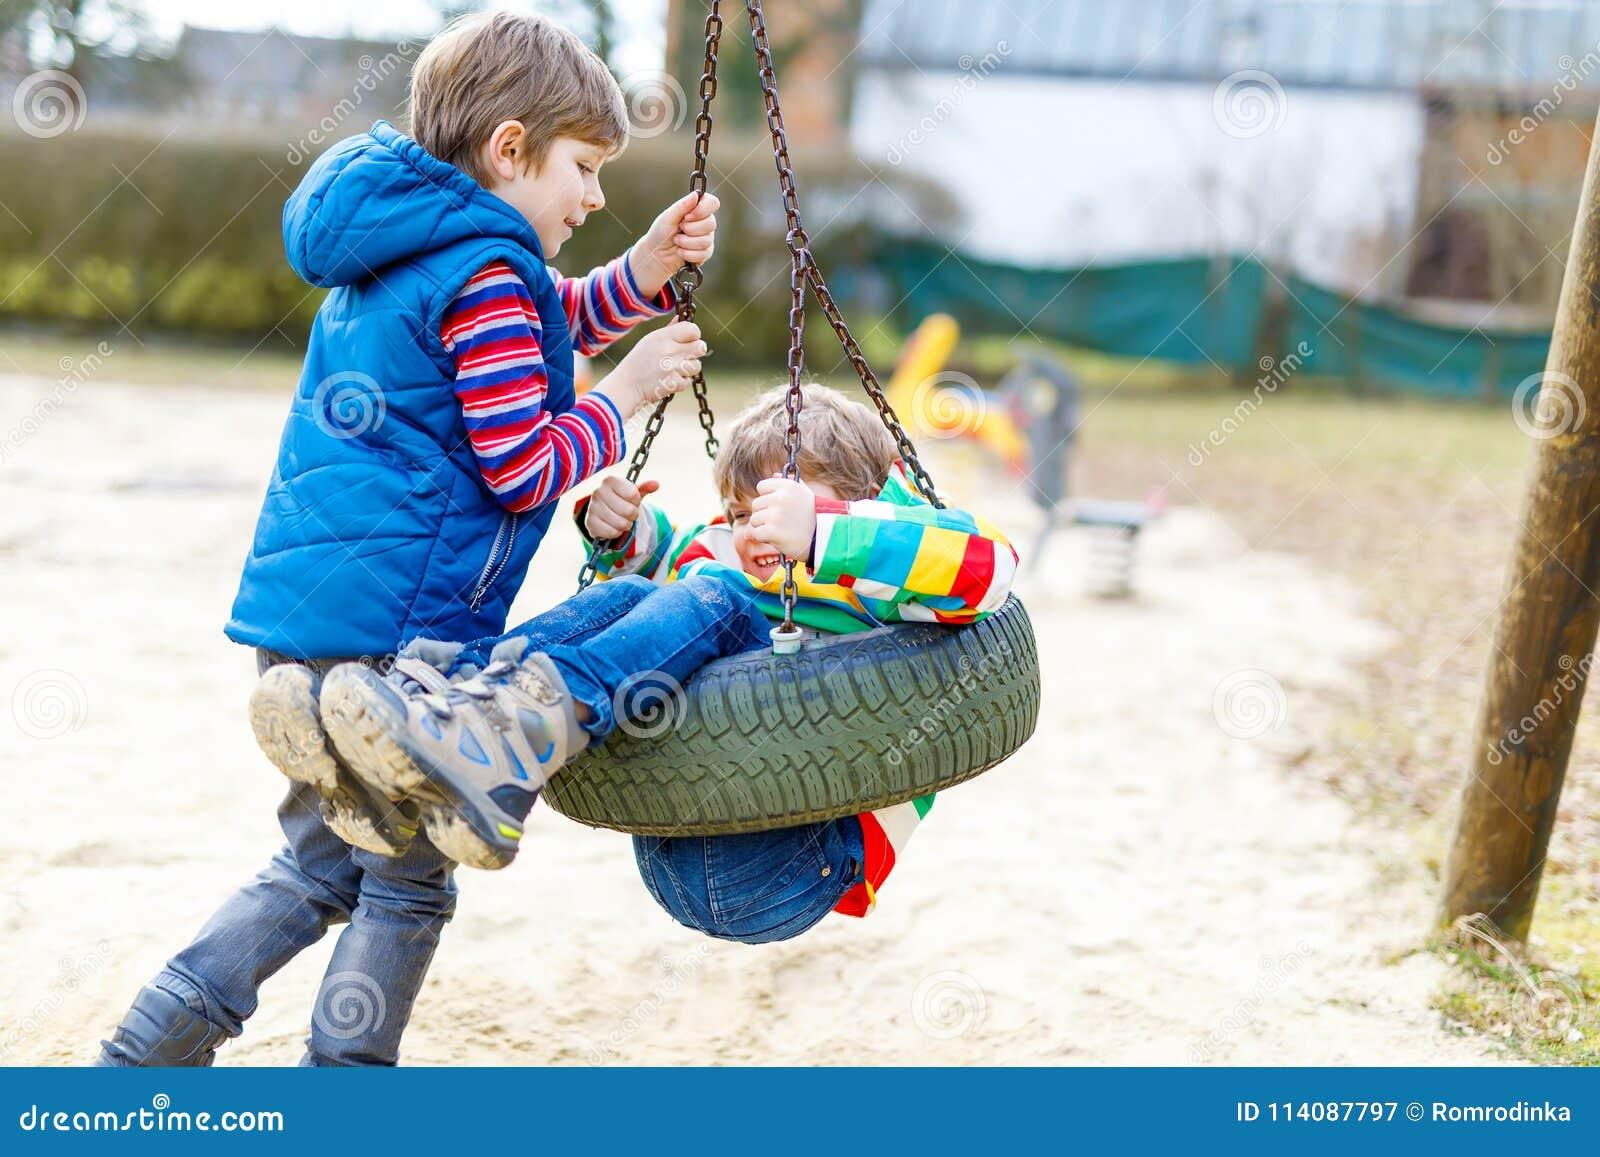 Swinging with best friends authoritative